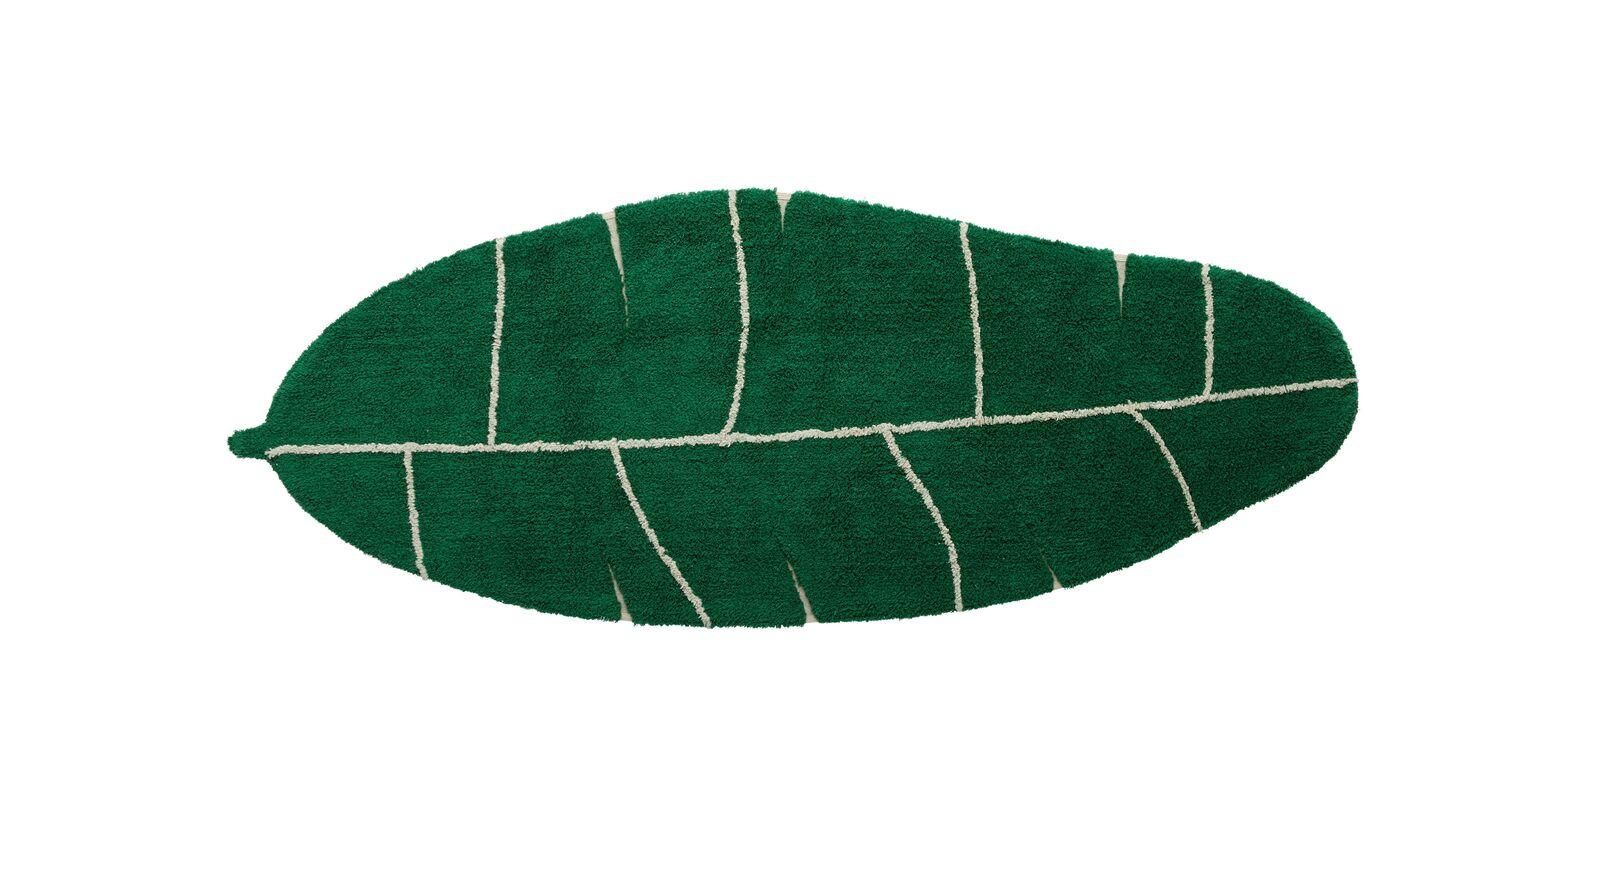 LIFETIME Teppiche Wild Life im Bananenblatt Design